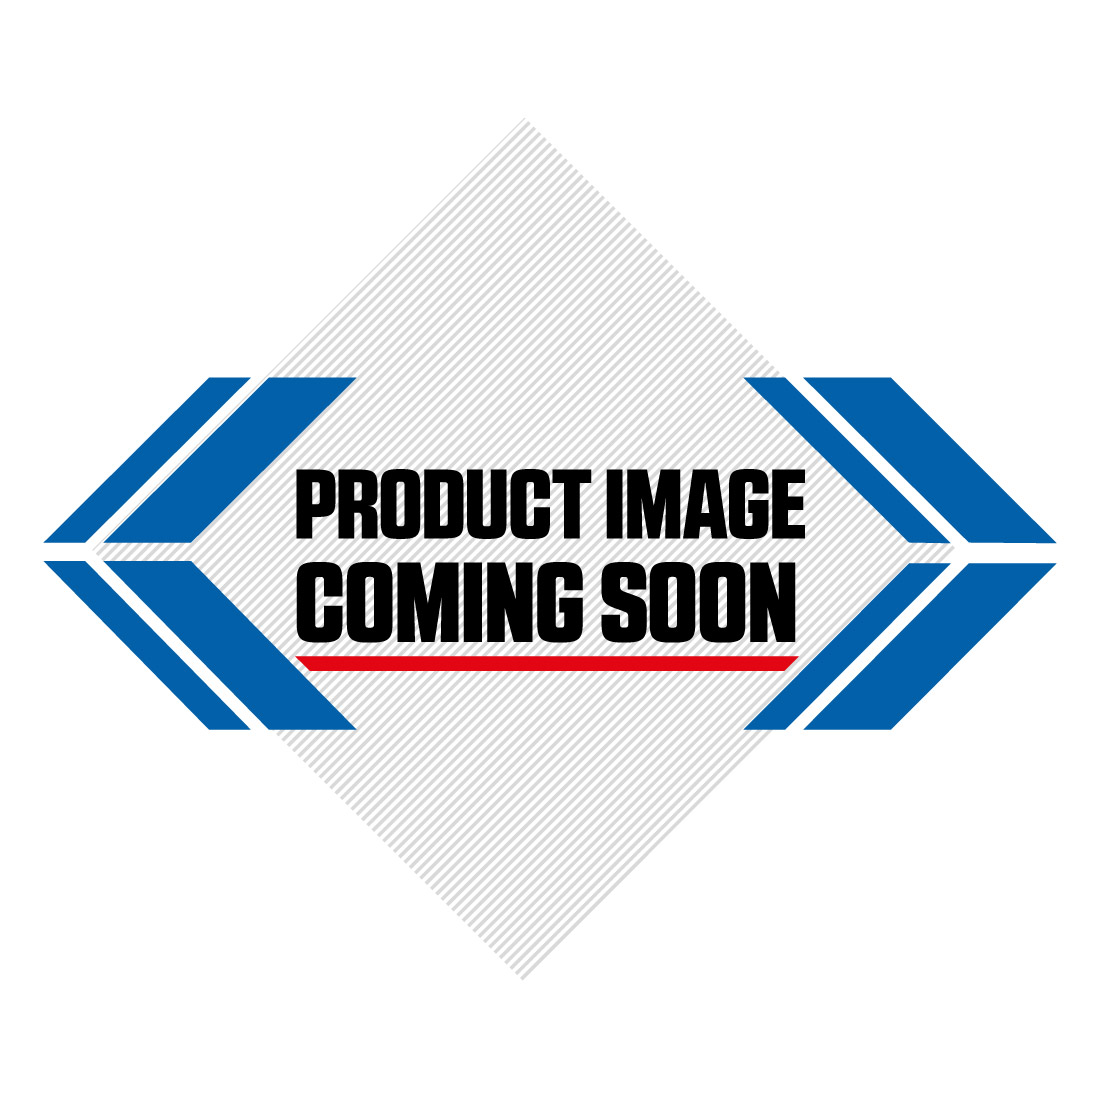 Renthal Twinring Rear Sprocket KTM SX SX-F EXC EXC-F Husqvarna TC FC TE FE - Black Image-5>